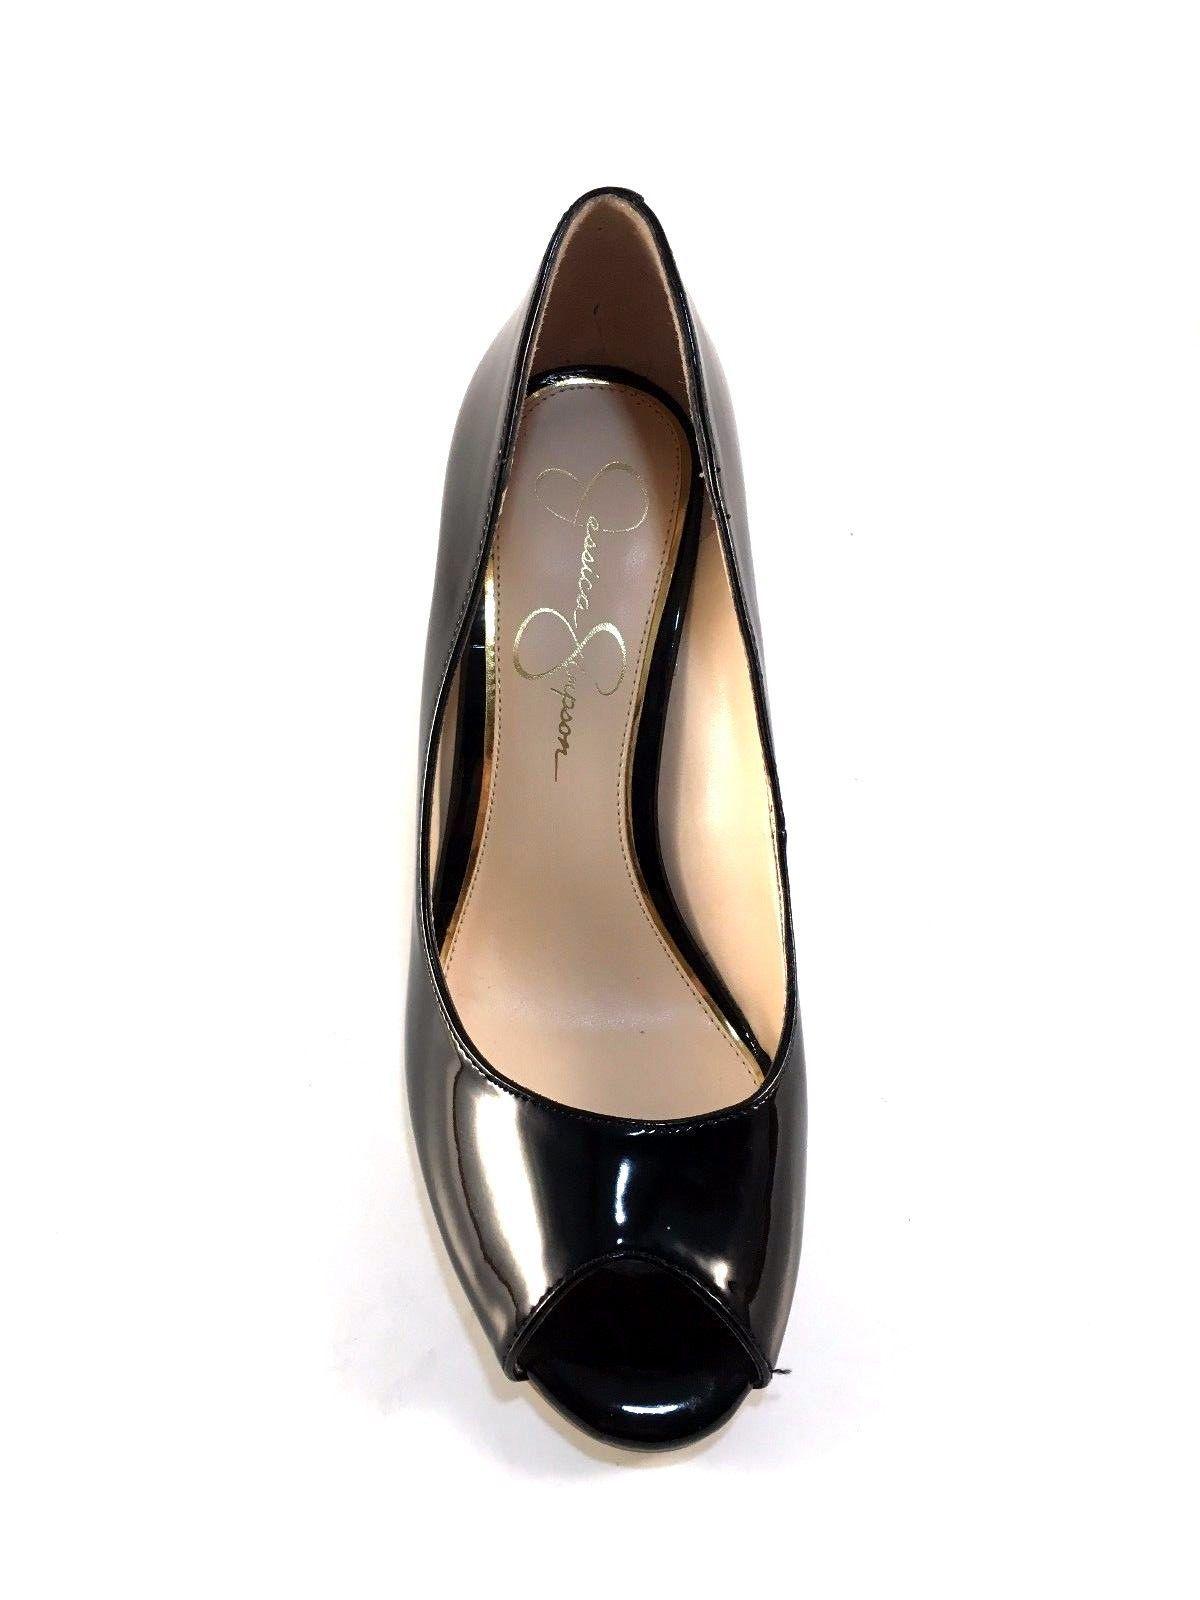 Jessica Simpson Lorion Black Patent Peeptoe Wedge Pumps Size 8 image 5